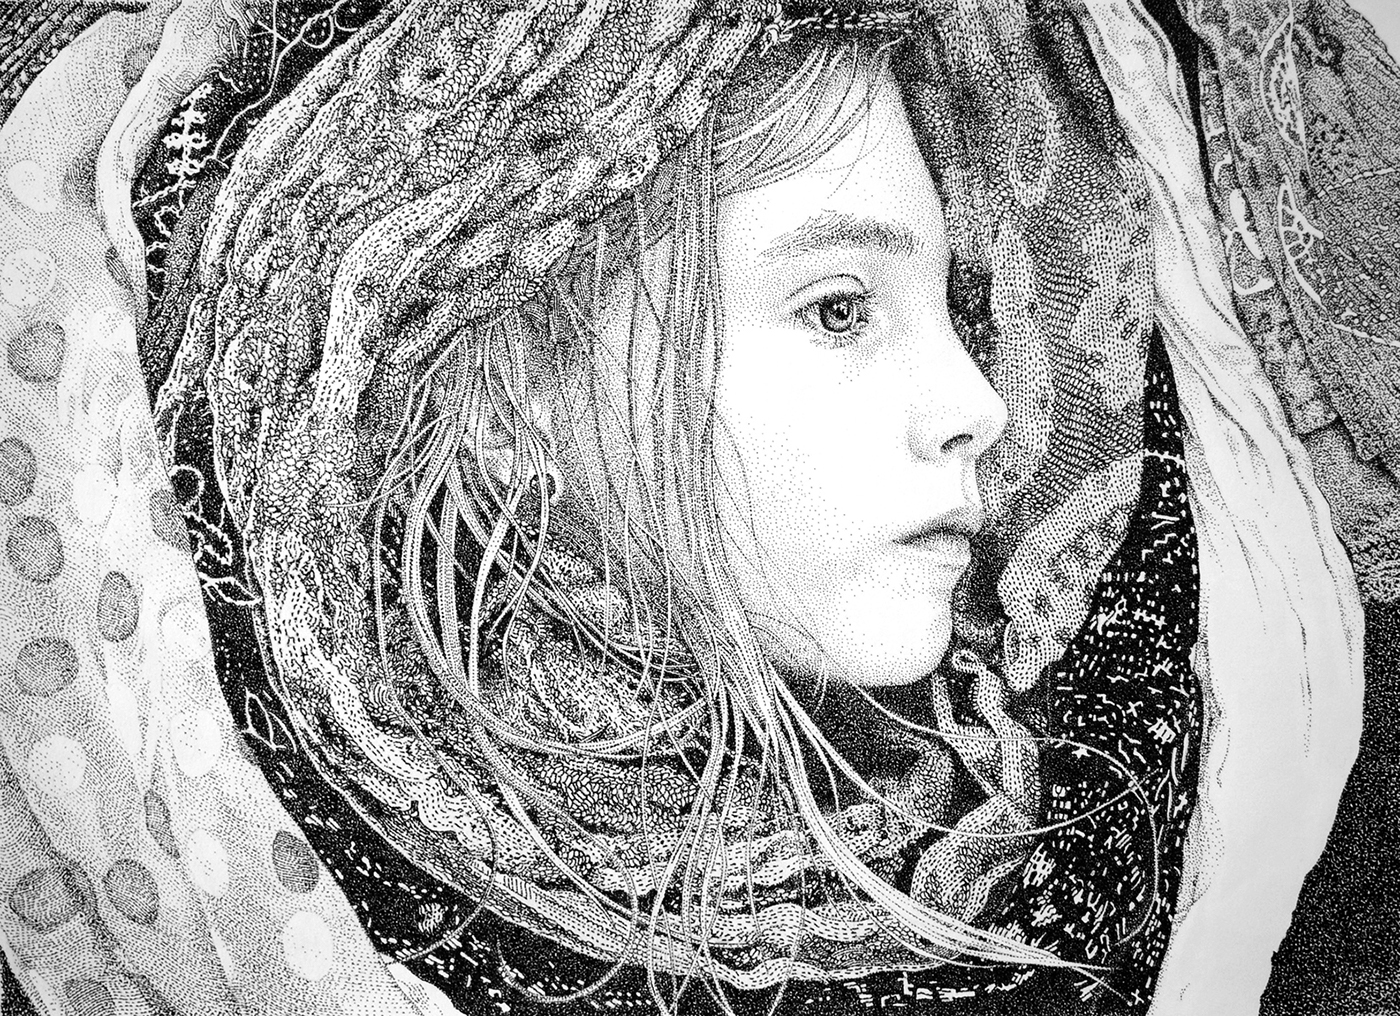 stippling Pointillism black ink ink paper draw child childhood fantasy conceptual allegory portrait dots